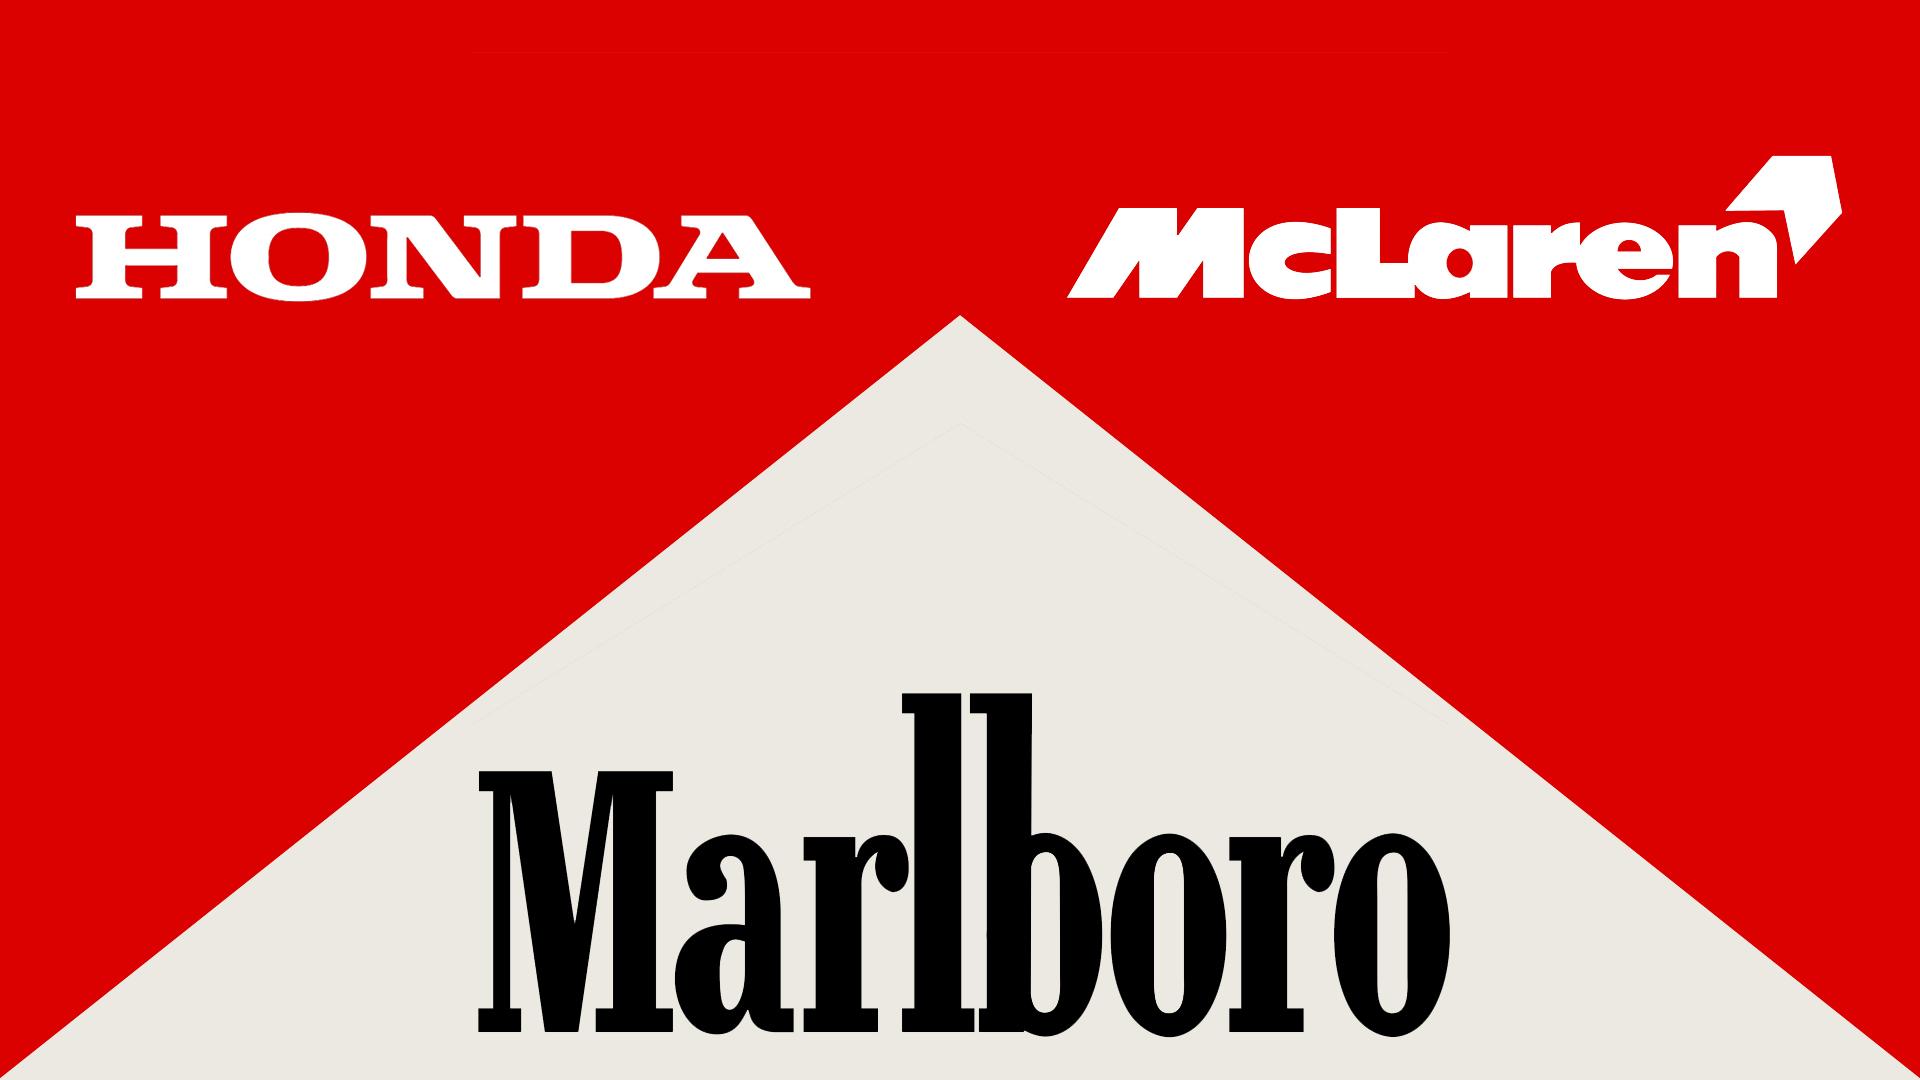 Honda Logo Wallpapers Download 1920x1080